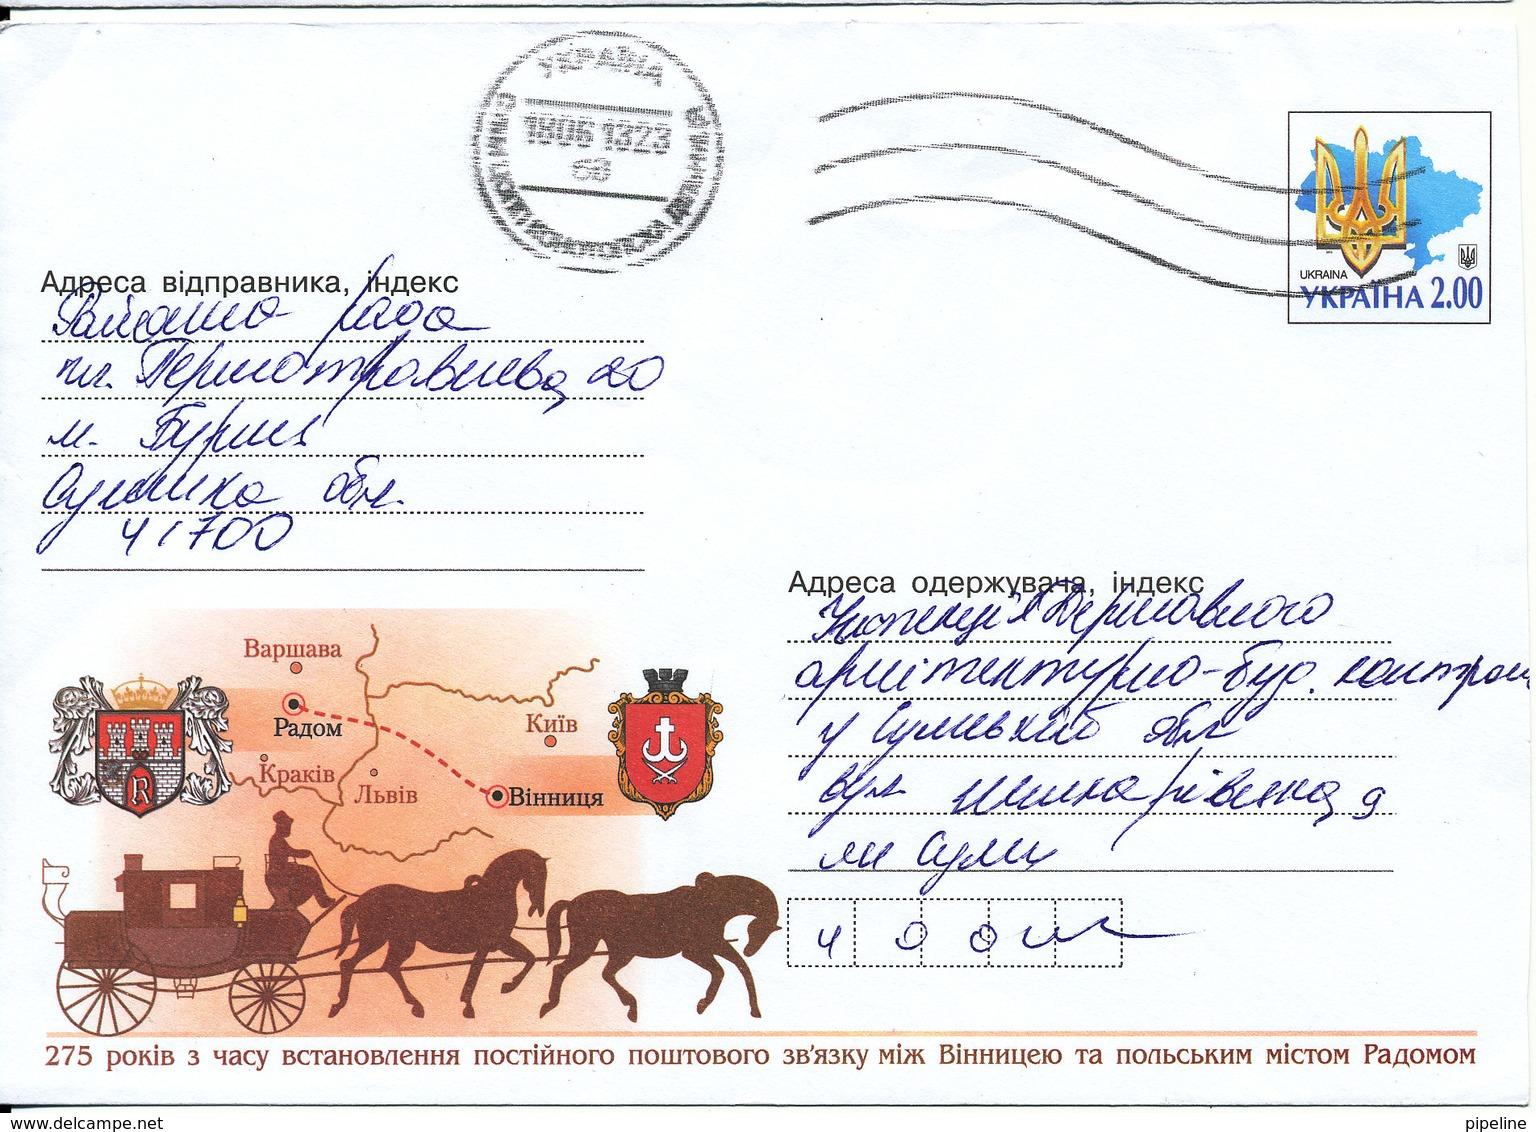 Ukraine Postal Stationery Cover With Cachet 18-6-2013 - Ukraine